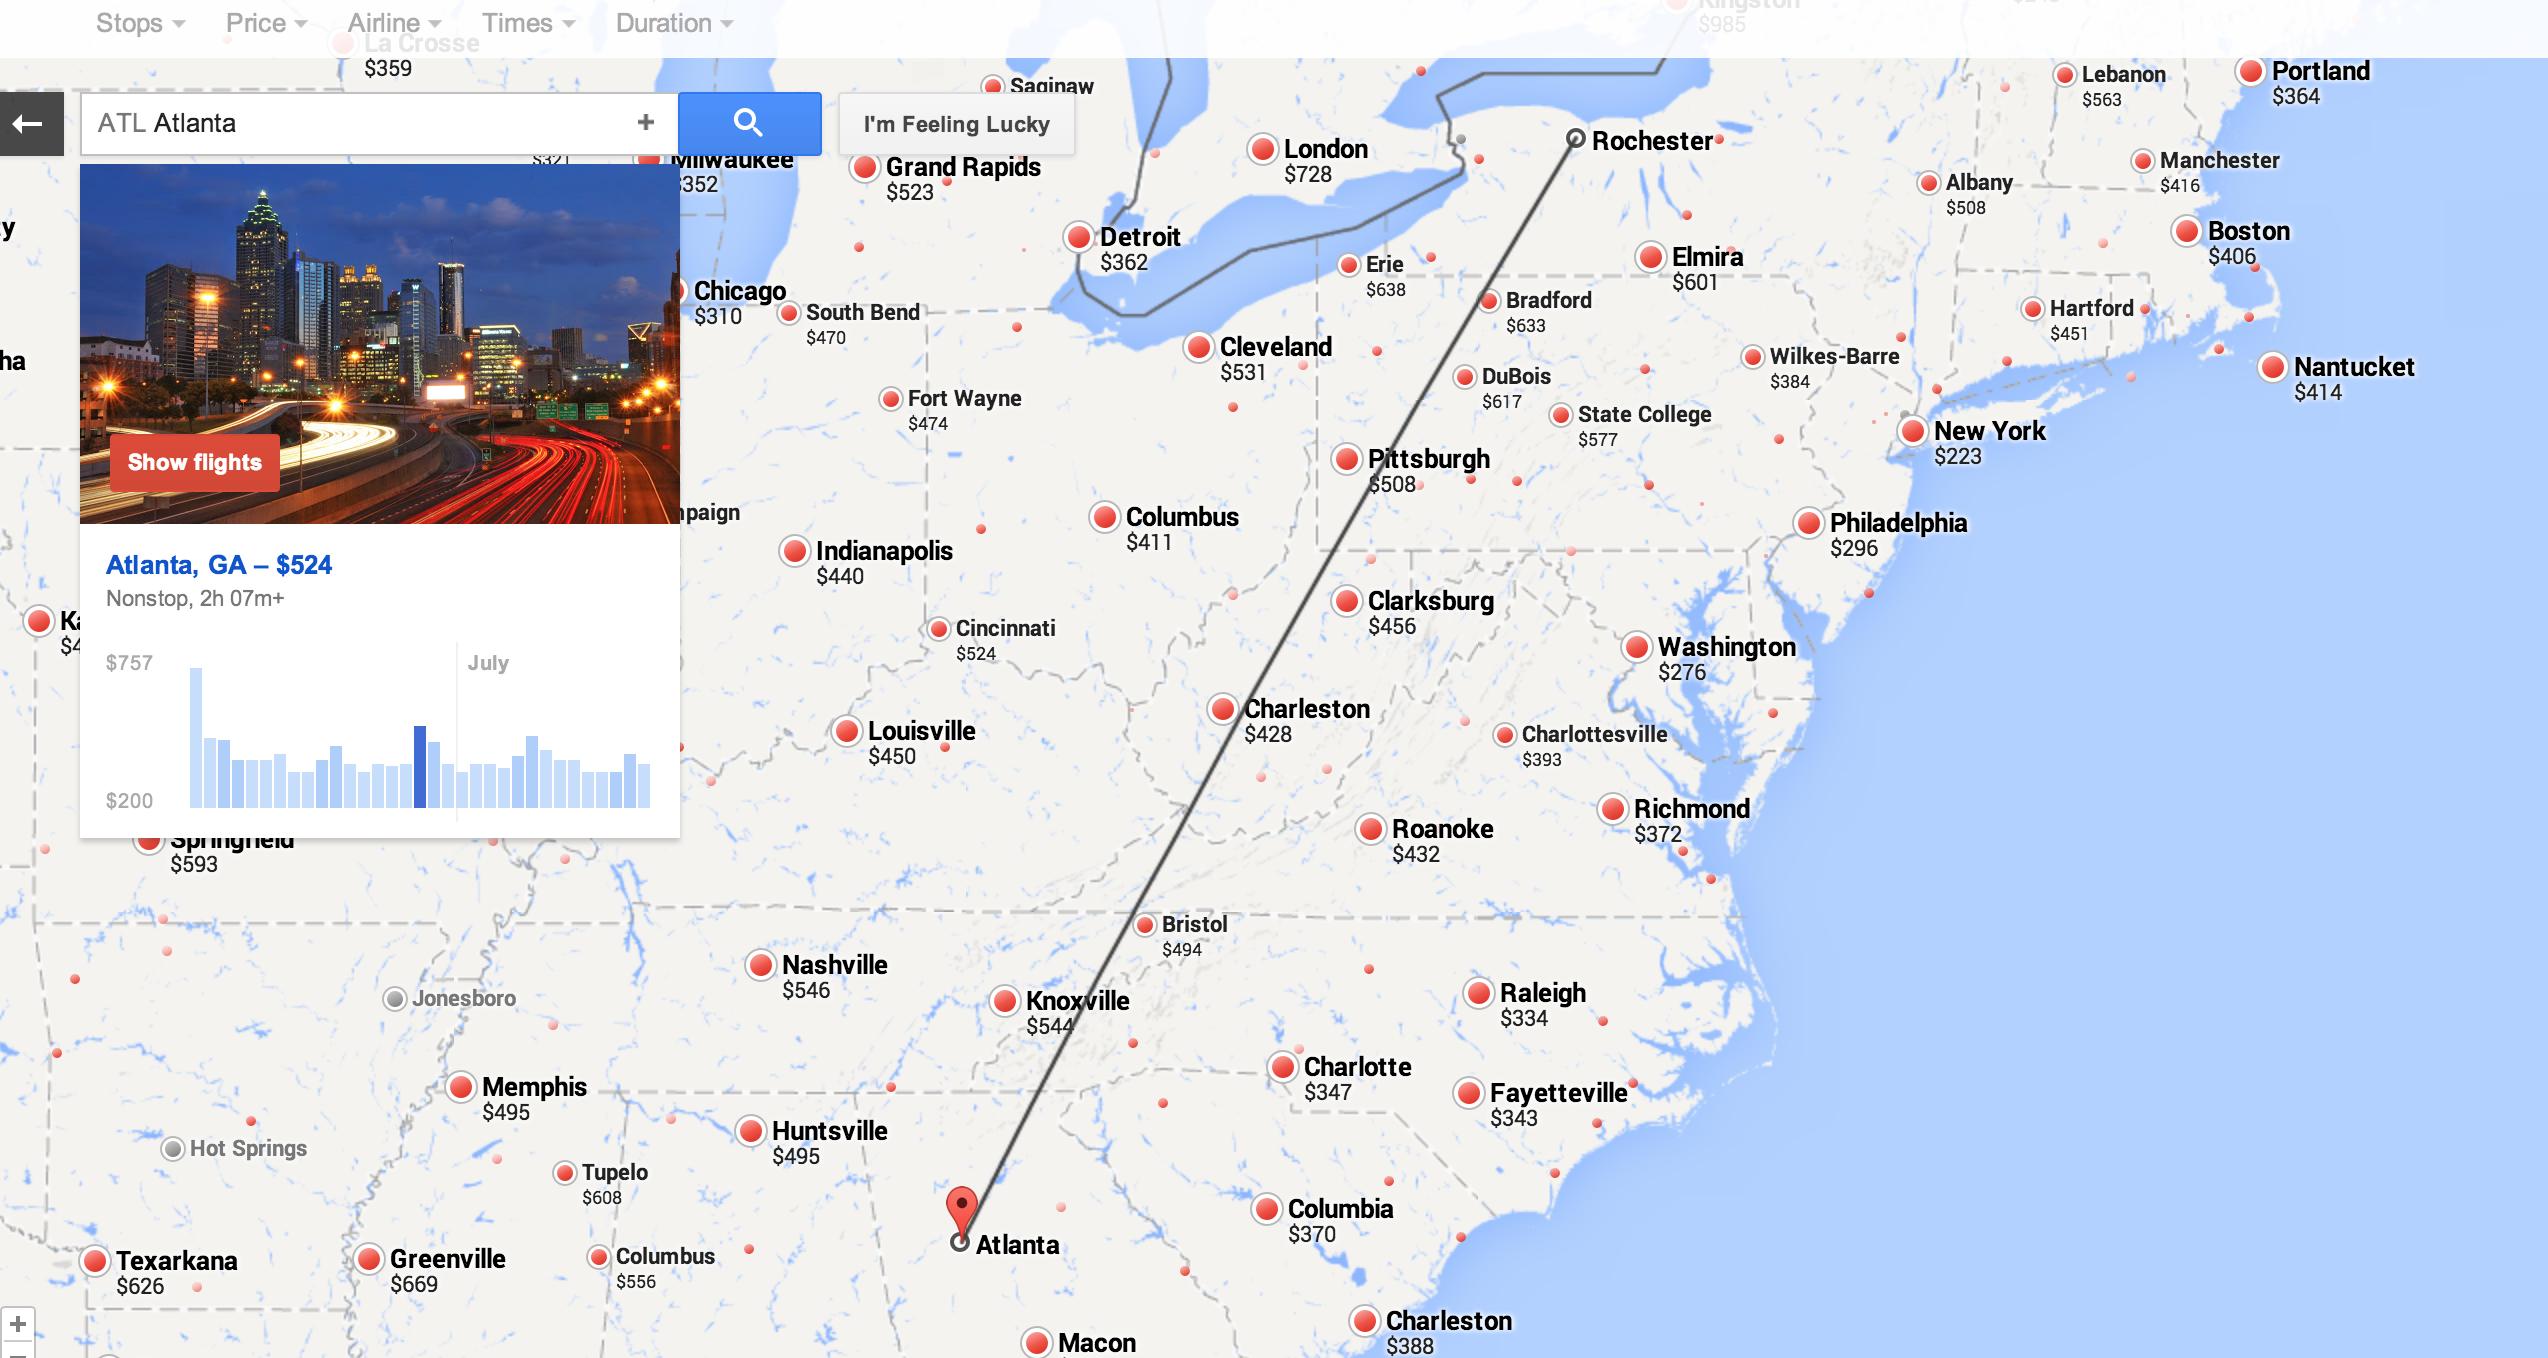 google hotel, google restaurants, google jewelry, google training, google salary, google tour, google airlines, google dining, google clothing, google tips, on google airfare map